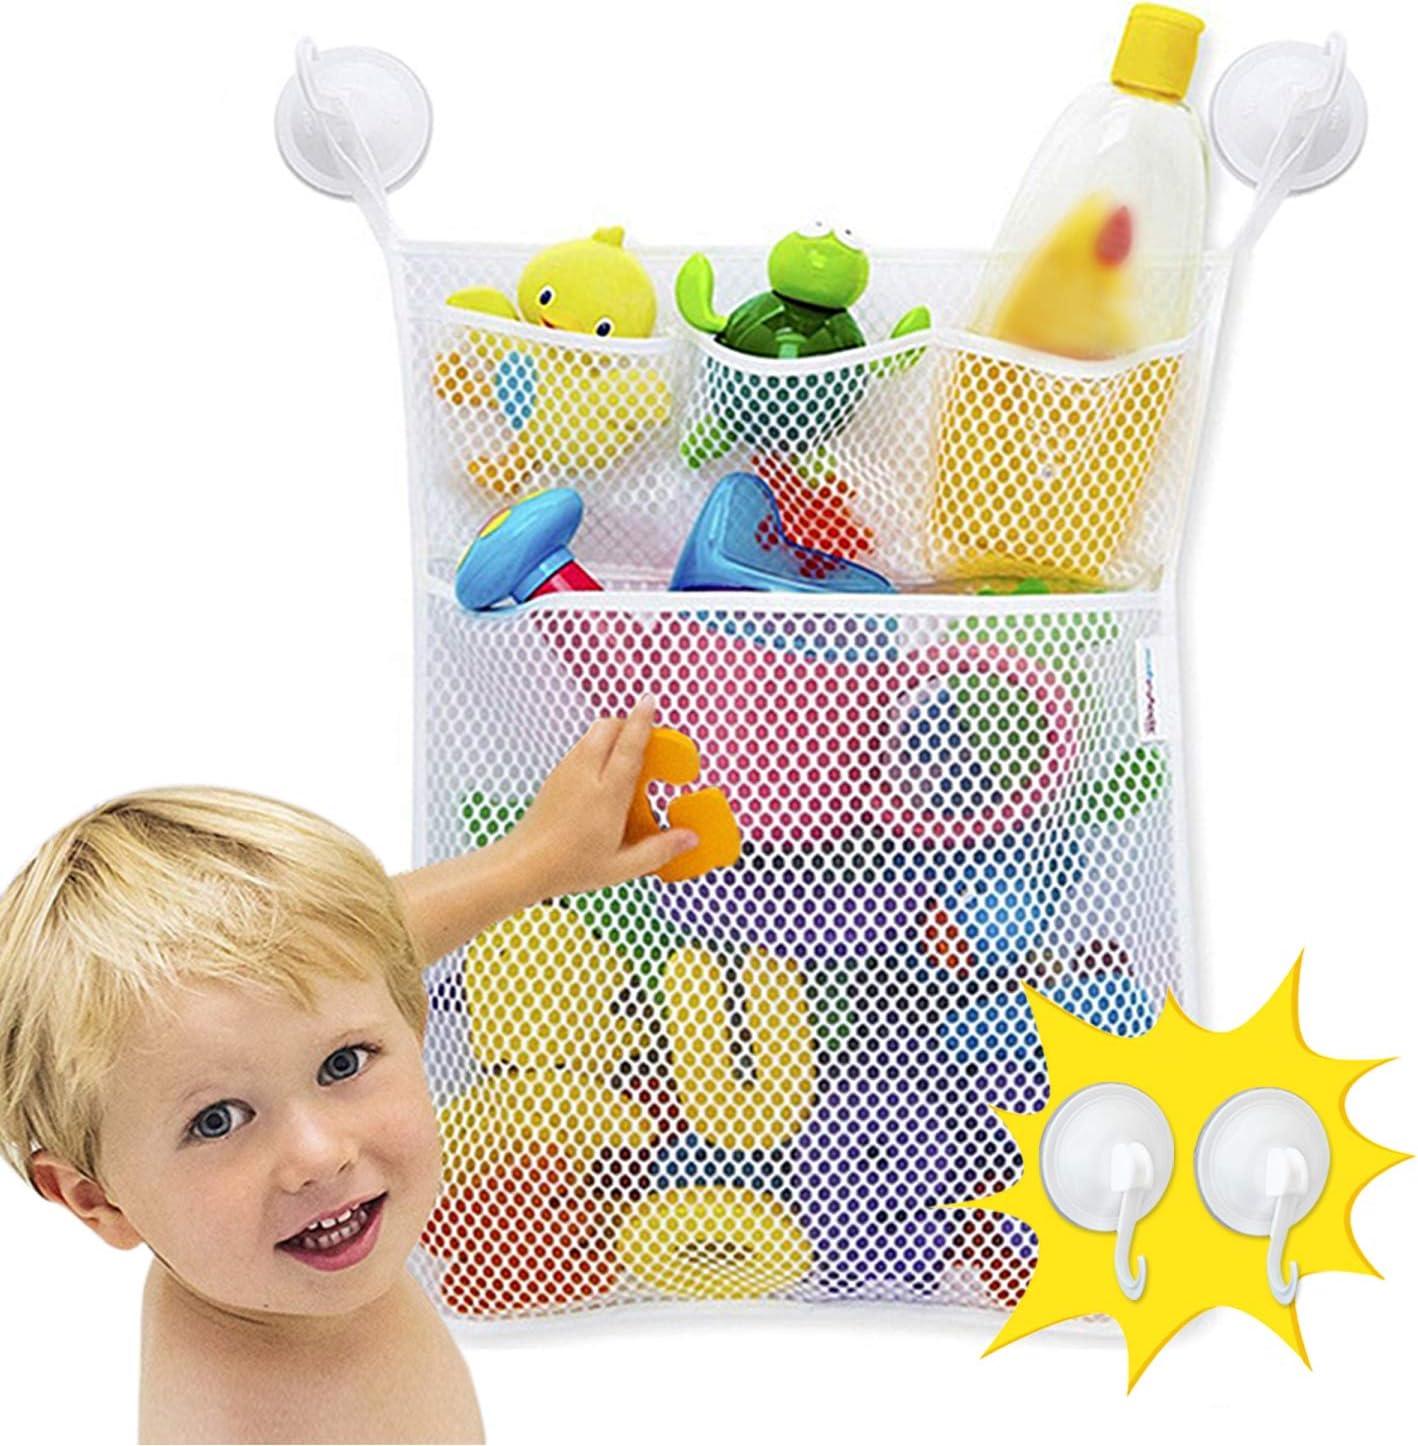 JUNSHEN Regular dealer Baby Seasonal Wrap Introduction Bath Toy Storage Bag Func Cups Suction 4 with Multi